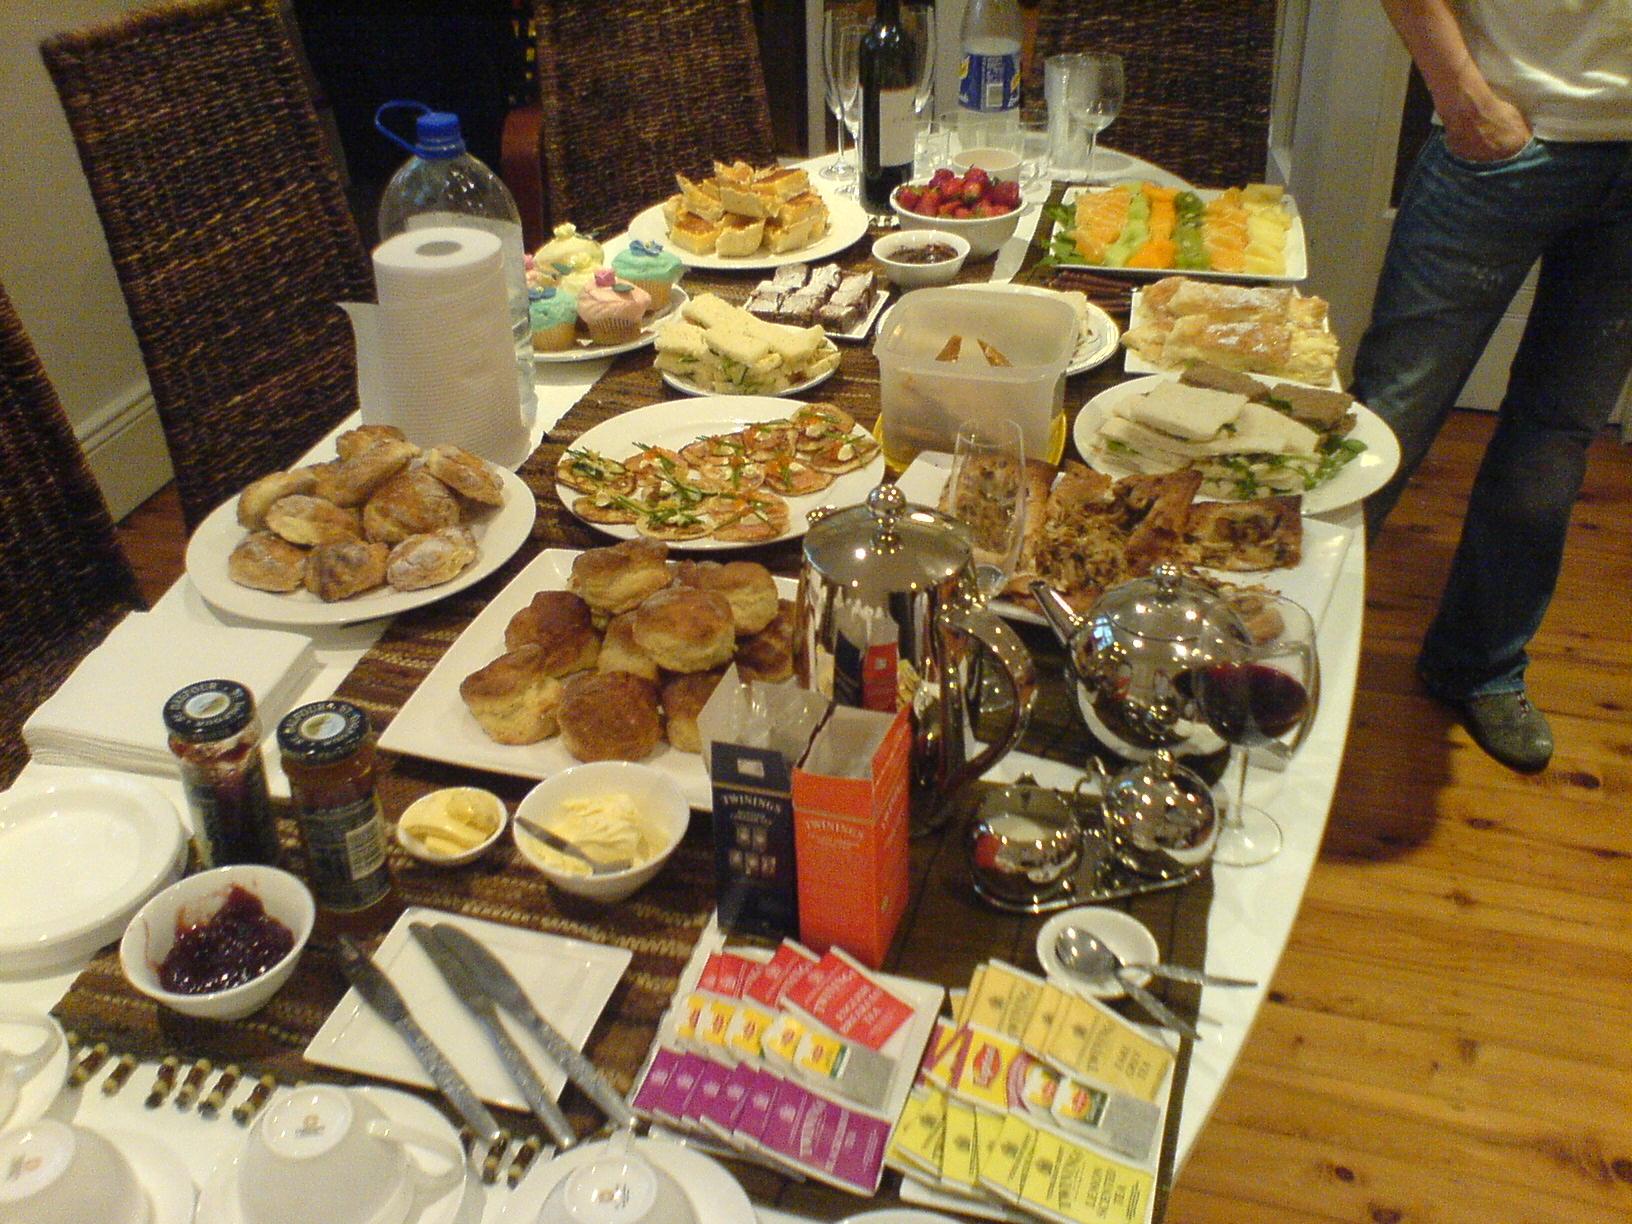 Impressive Buffet Table Set Up Ideas 1632 x 1224 · 380 kB · jpeg